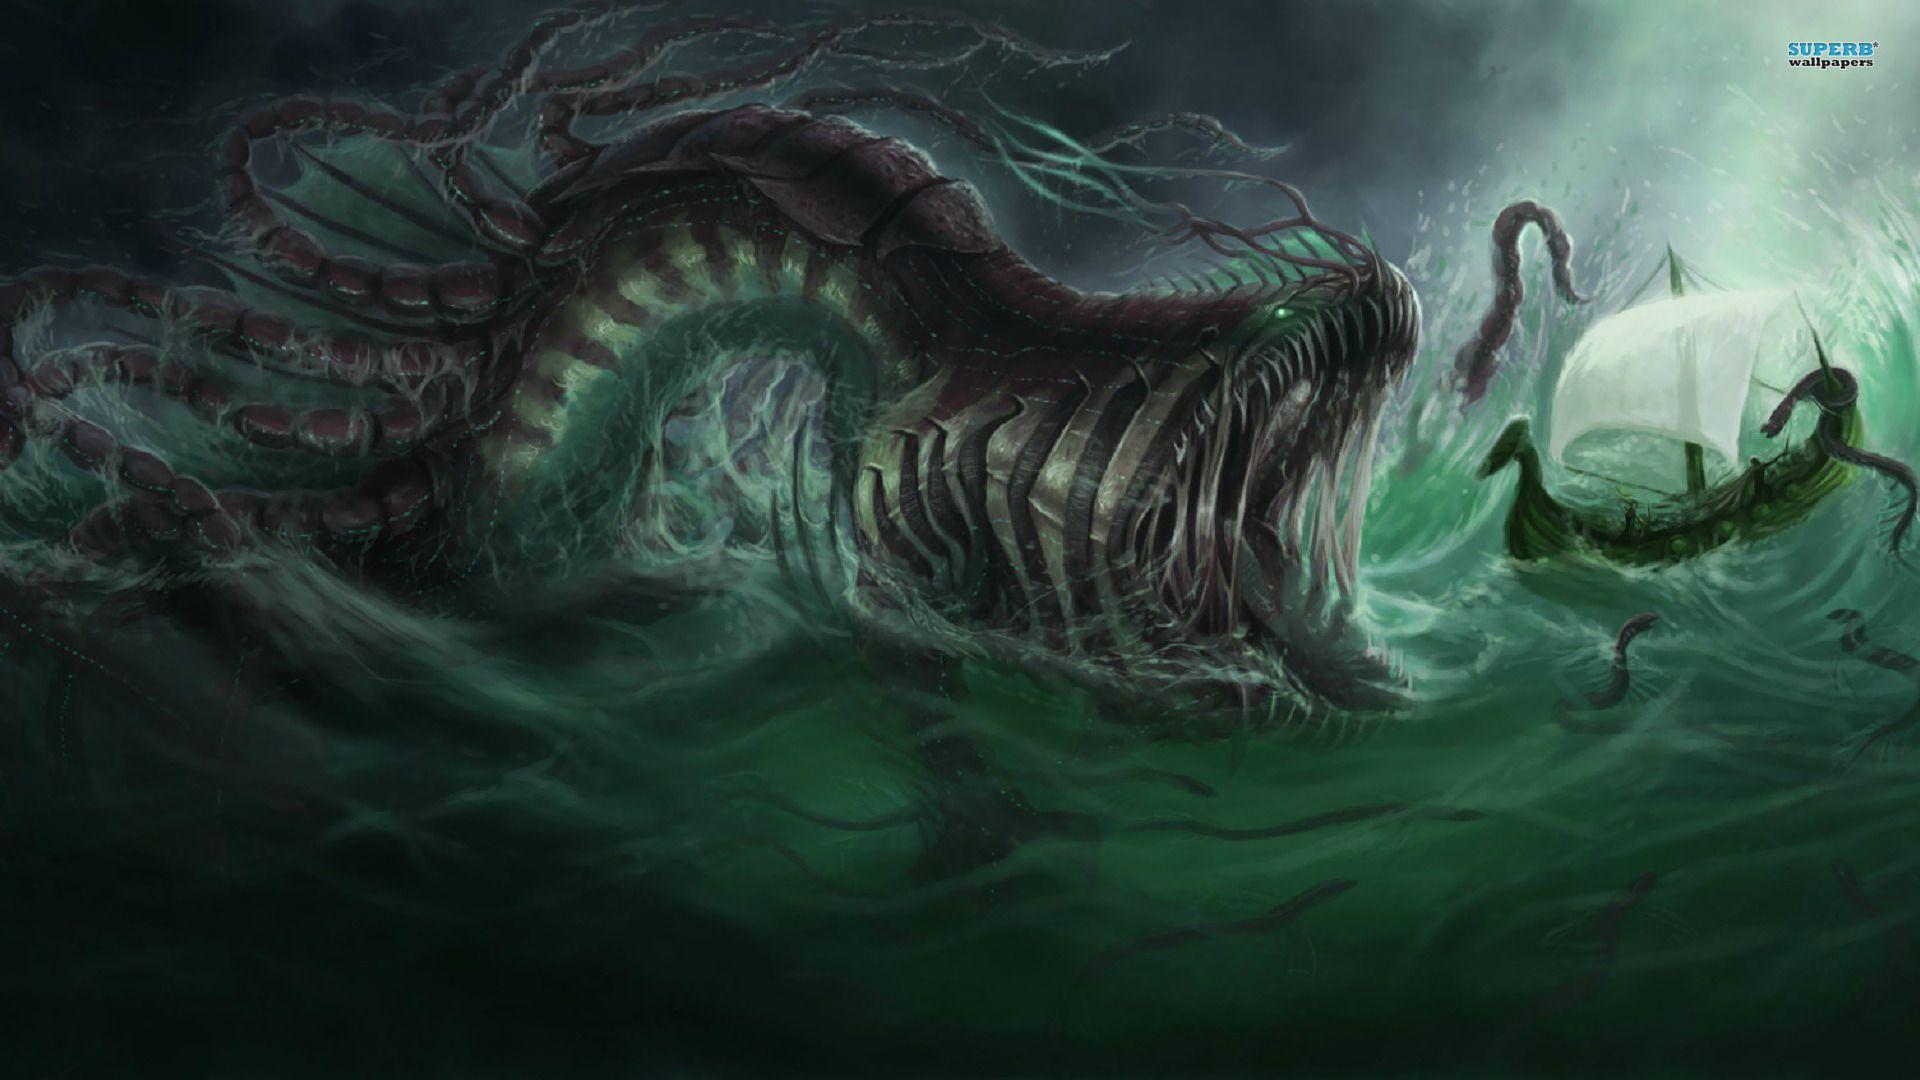 Wallpaper Dump Sea Monsters Monster Pictures Ocean Monsters